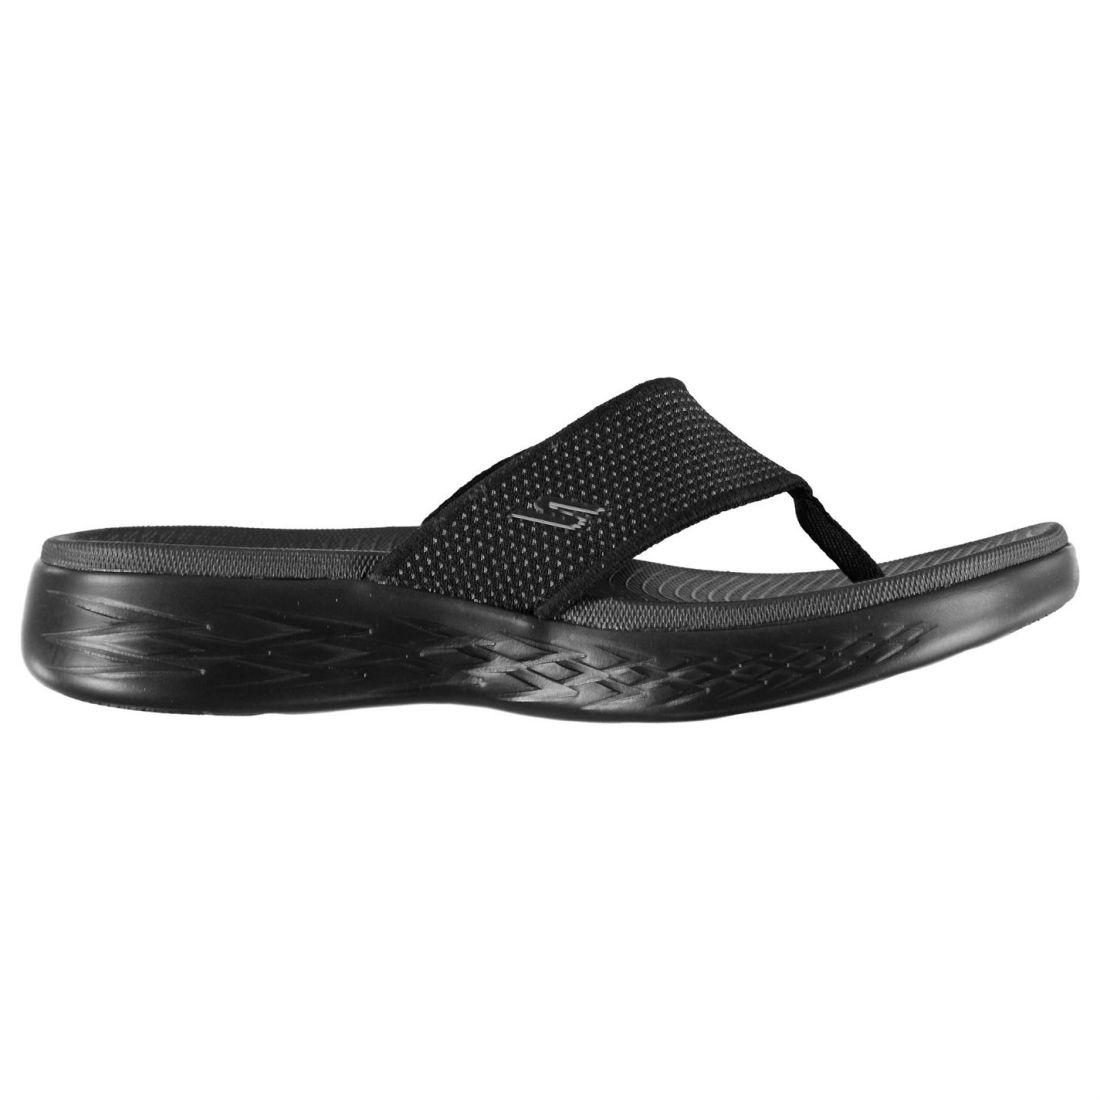 ca821e69c Details about Skechers Mens On The Go 600 Sliders Flip Flops Lightweight  Strap Toe Post